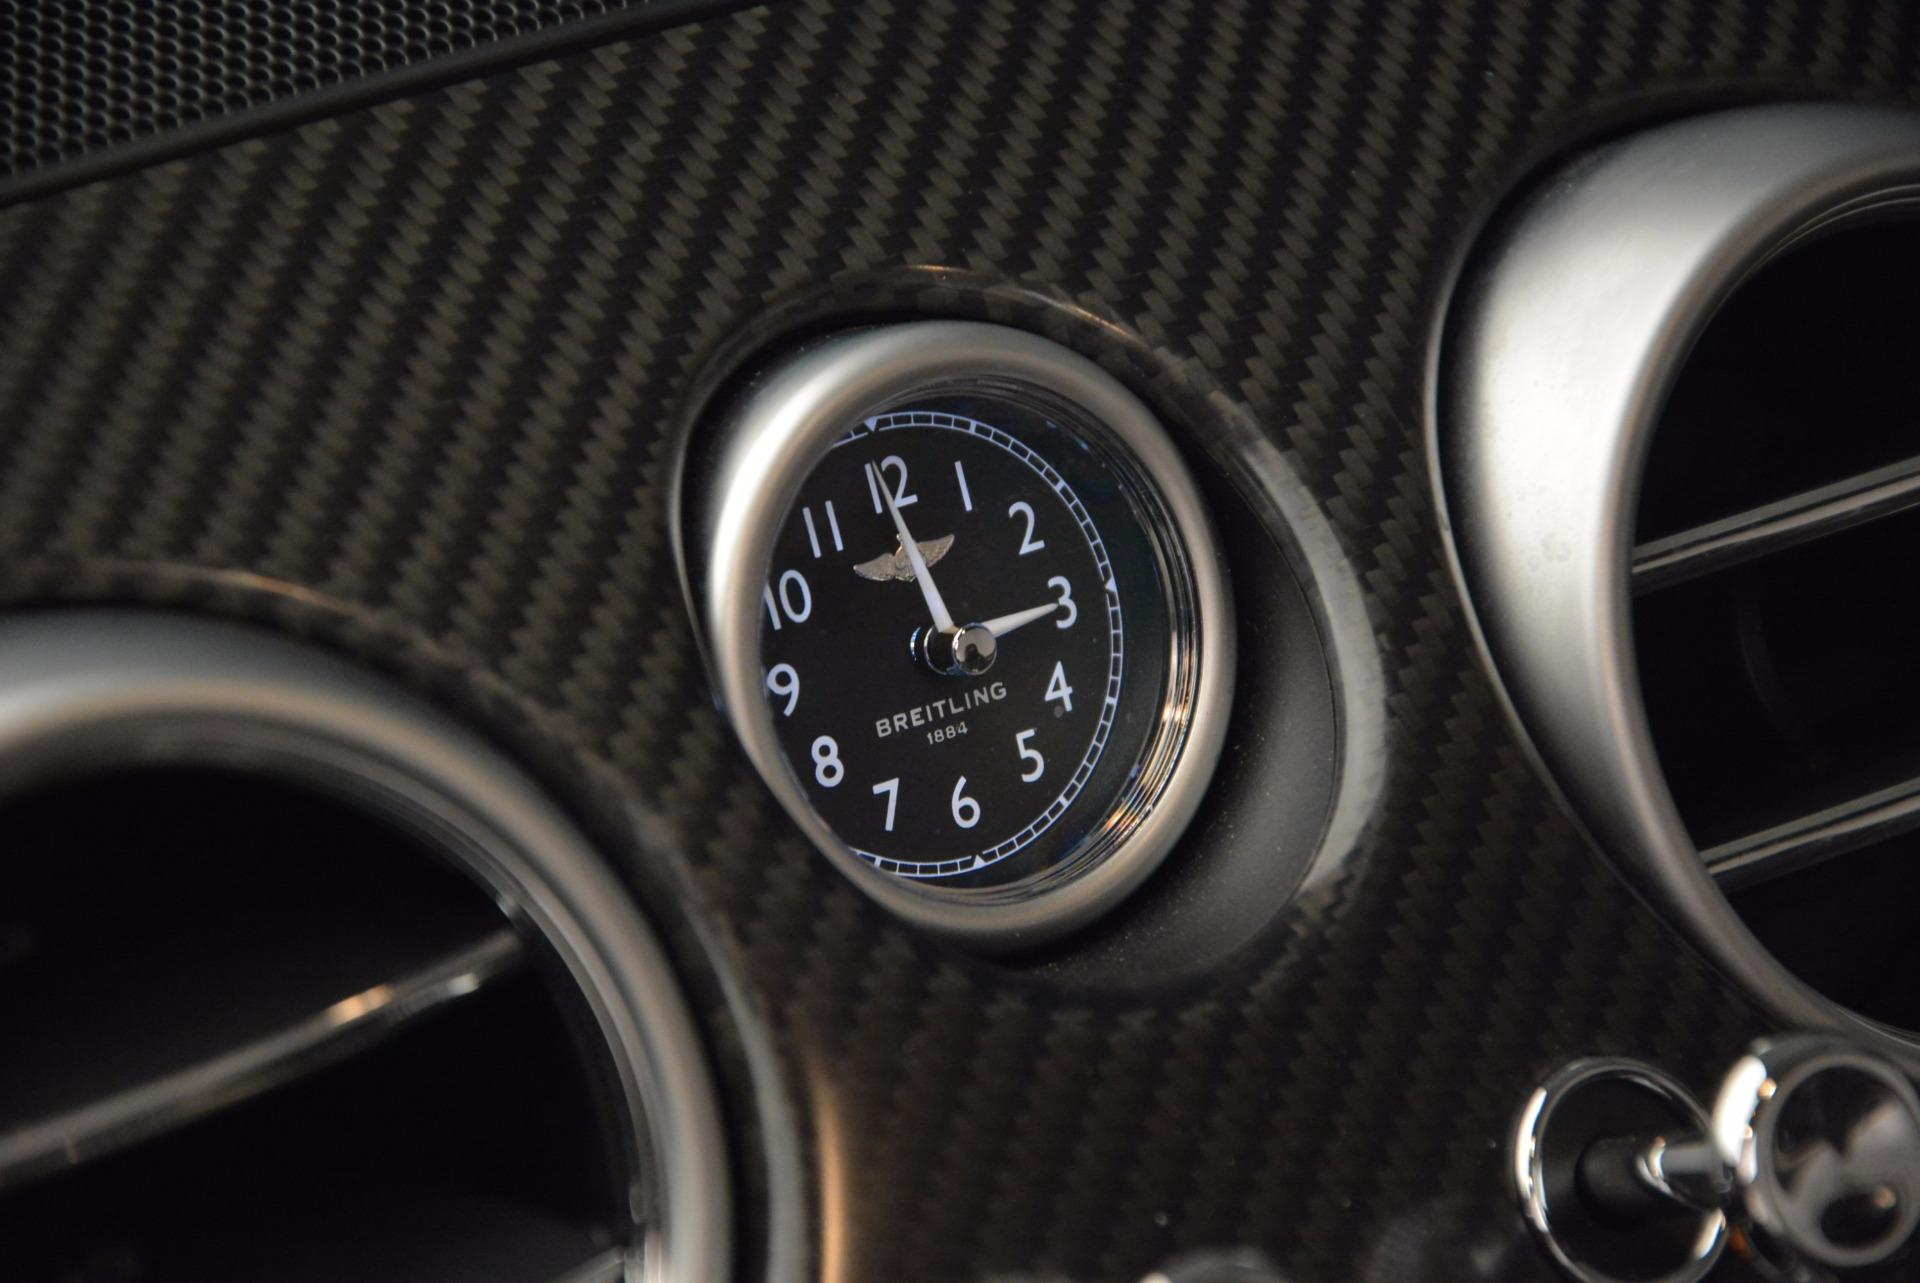 Used 2015 Bentley Continental GT Speed For Sale In Westport, CT 1714_p37